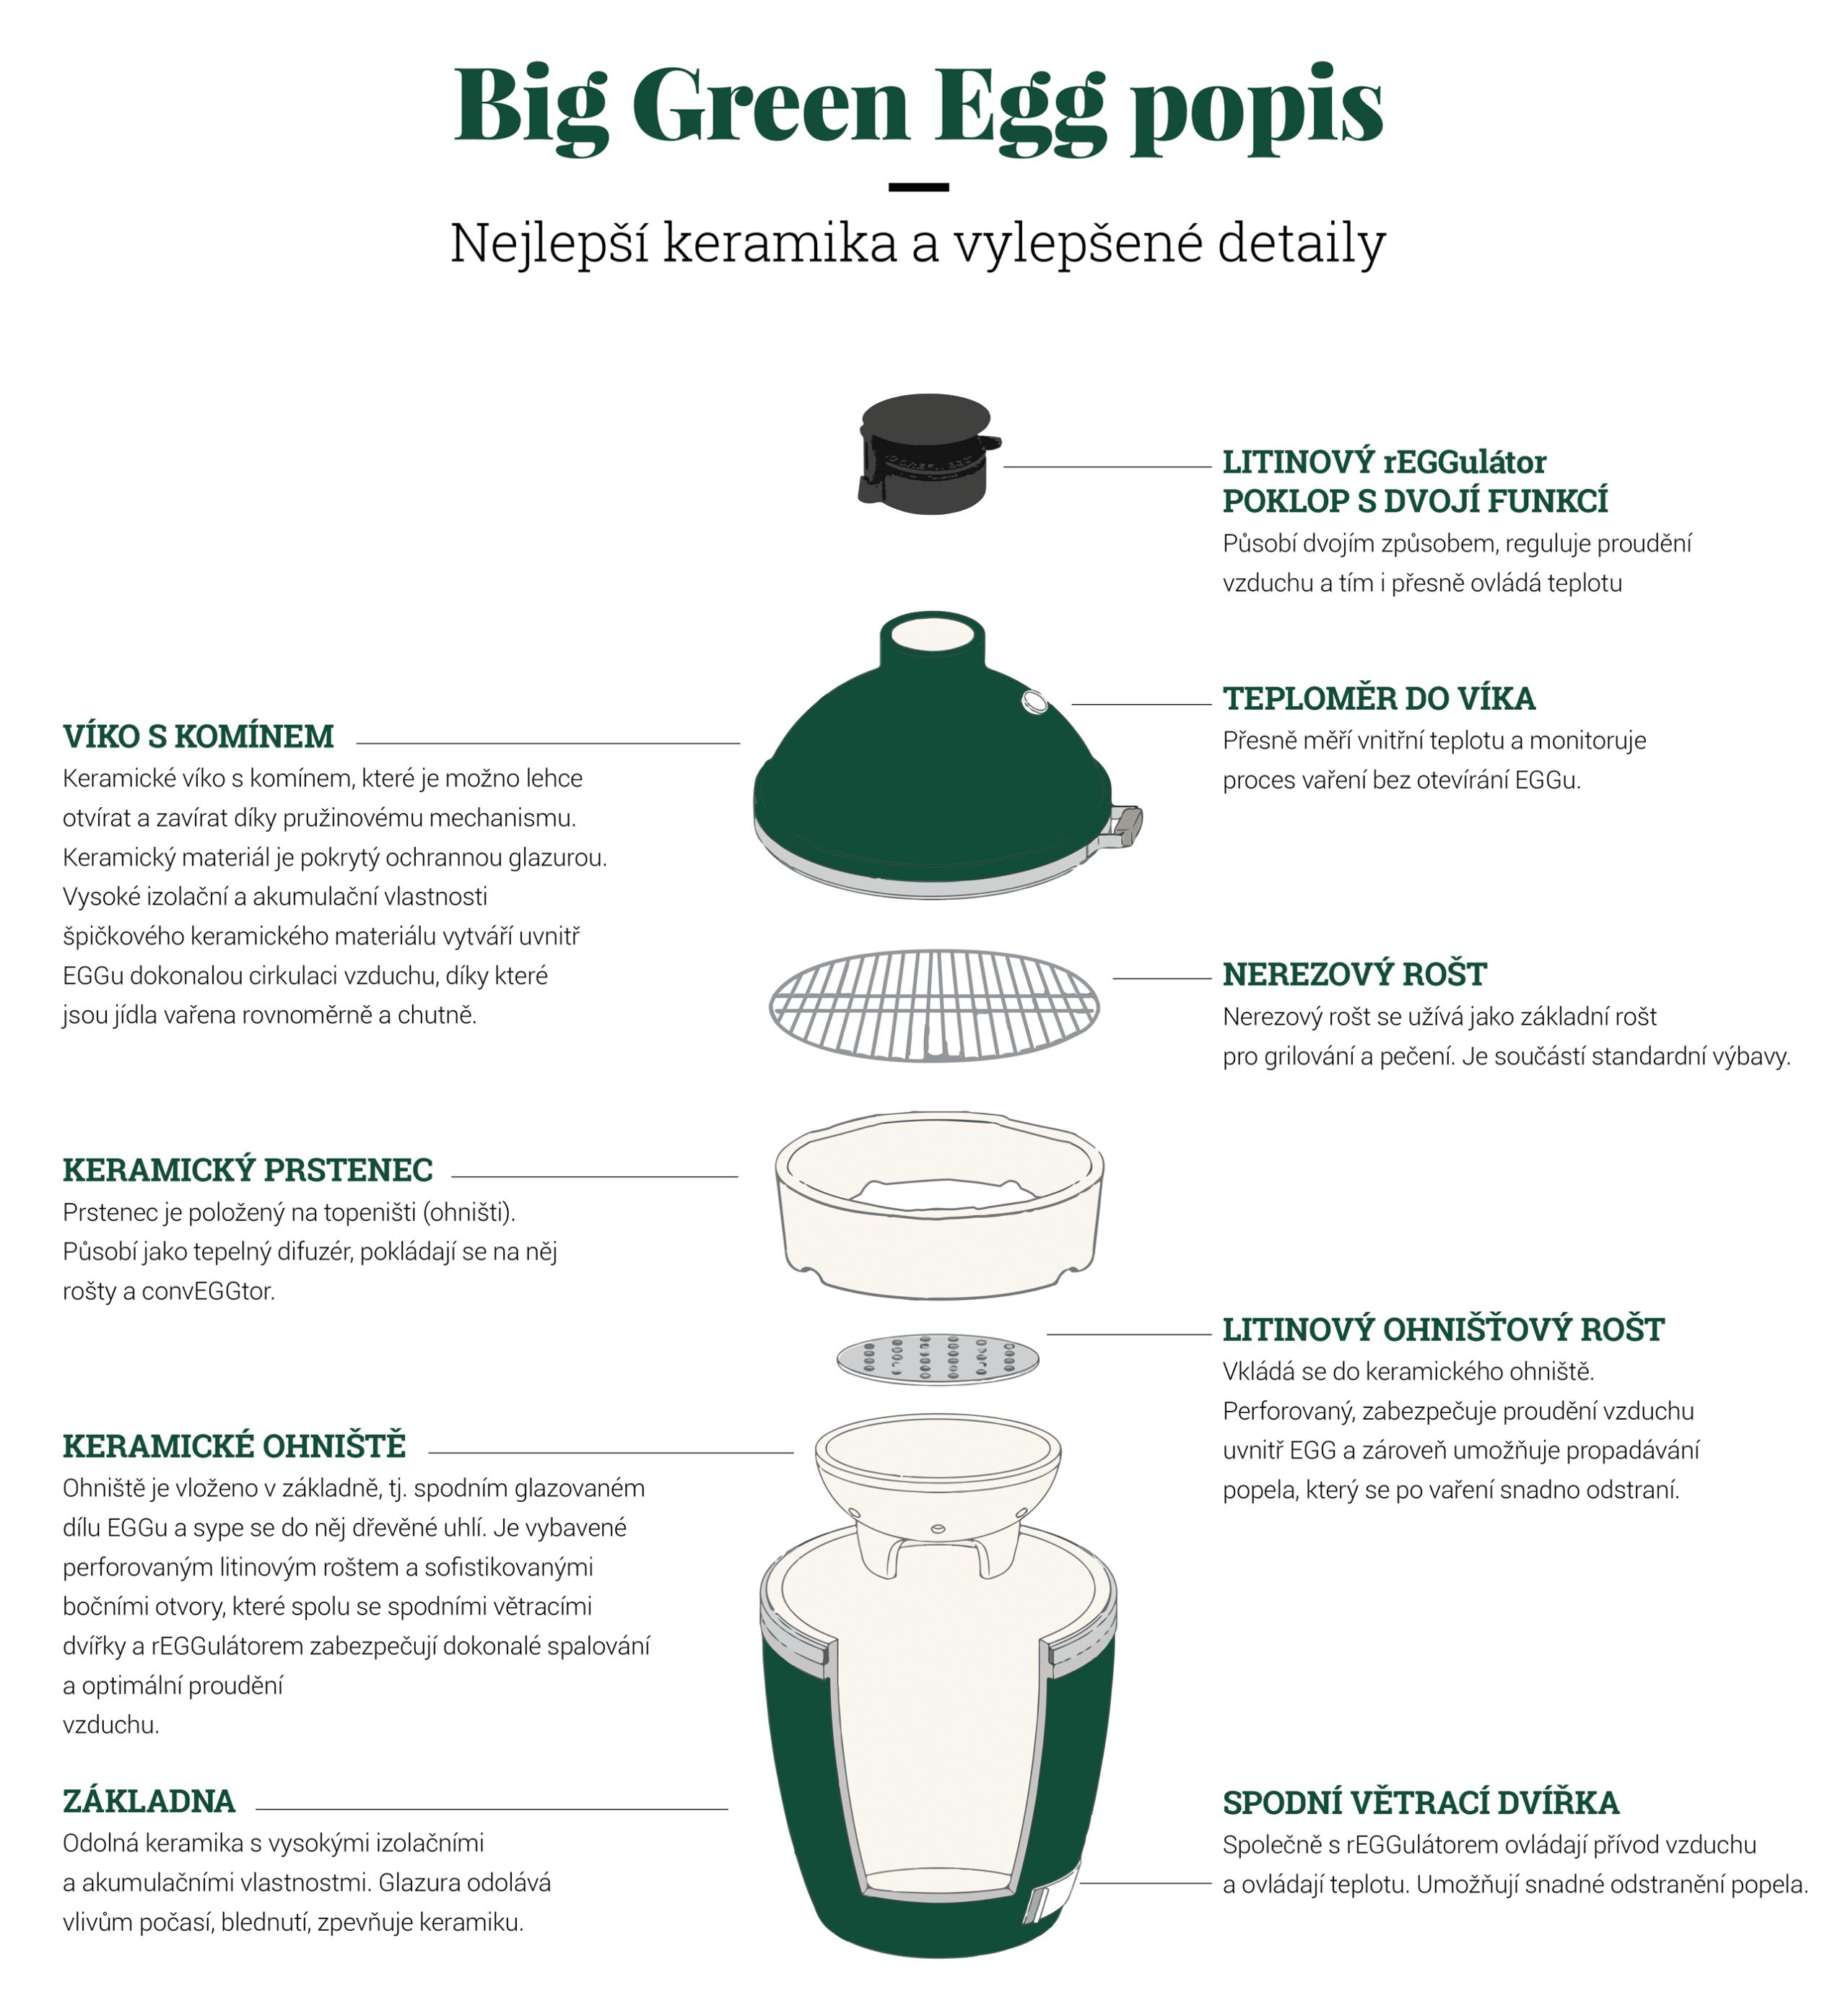 Big Green Egg popis